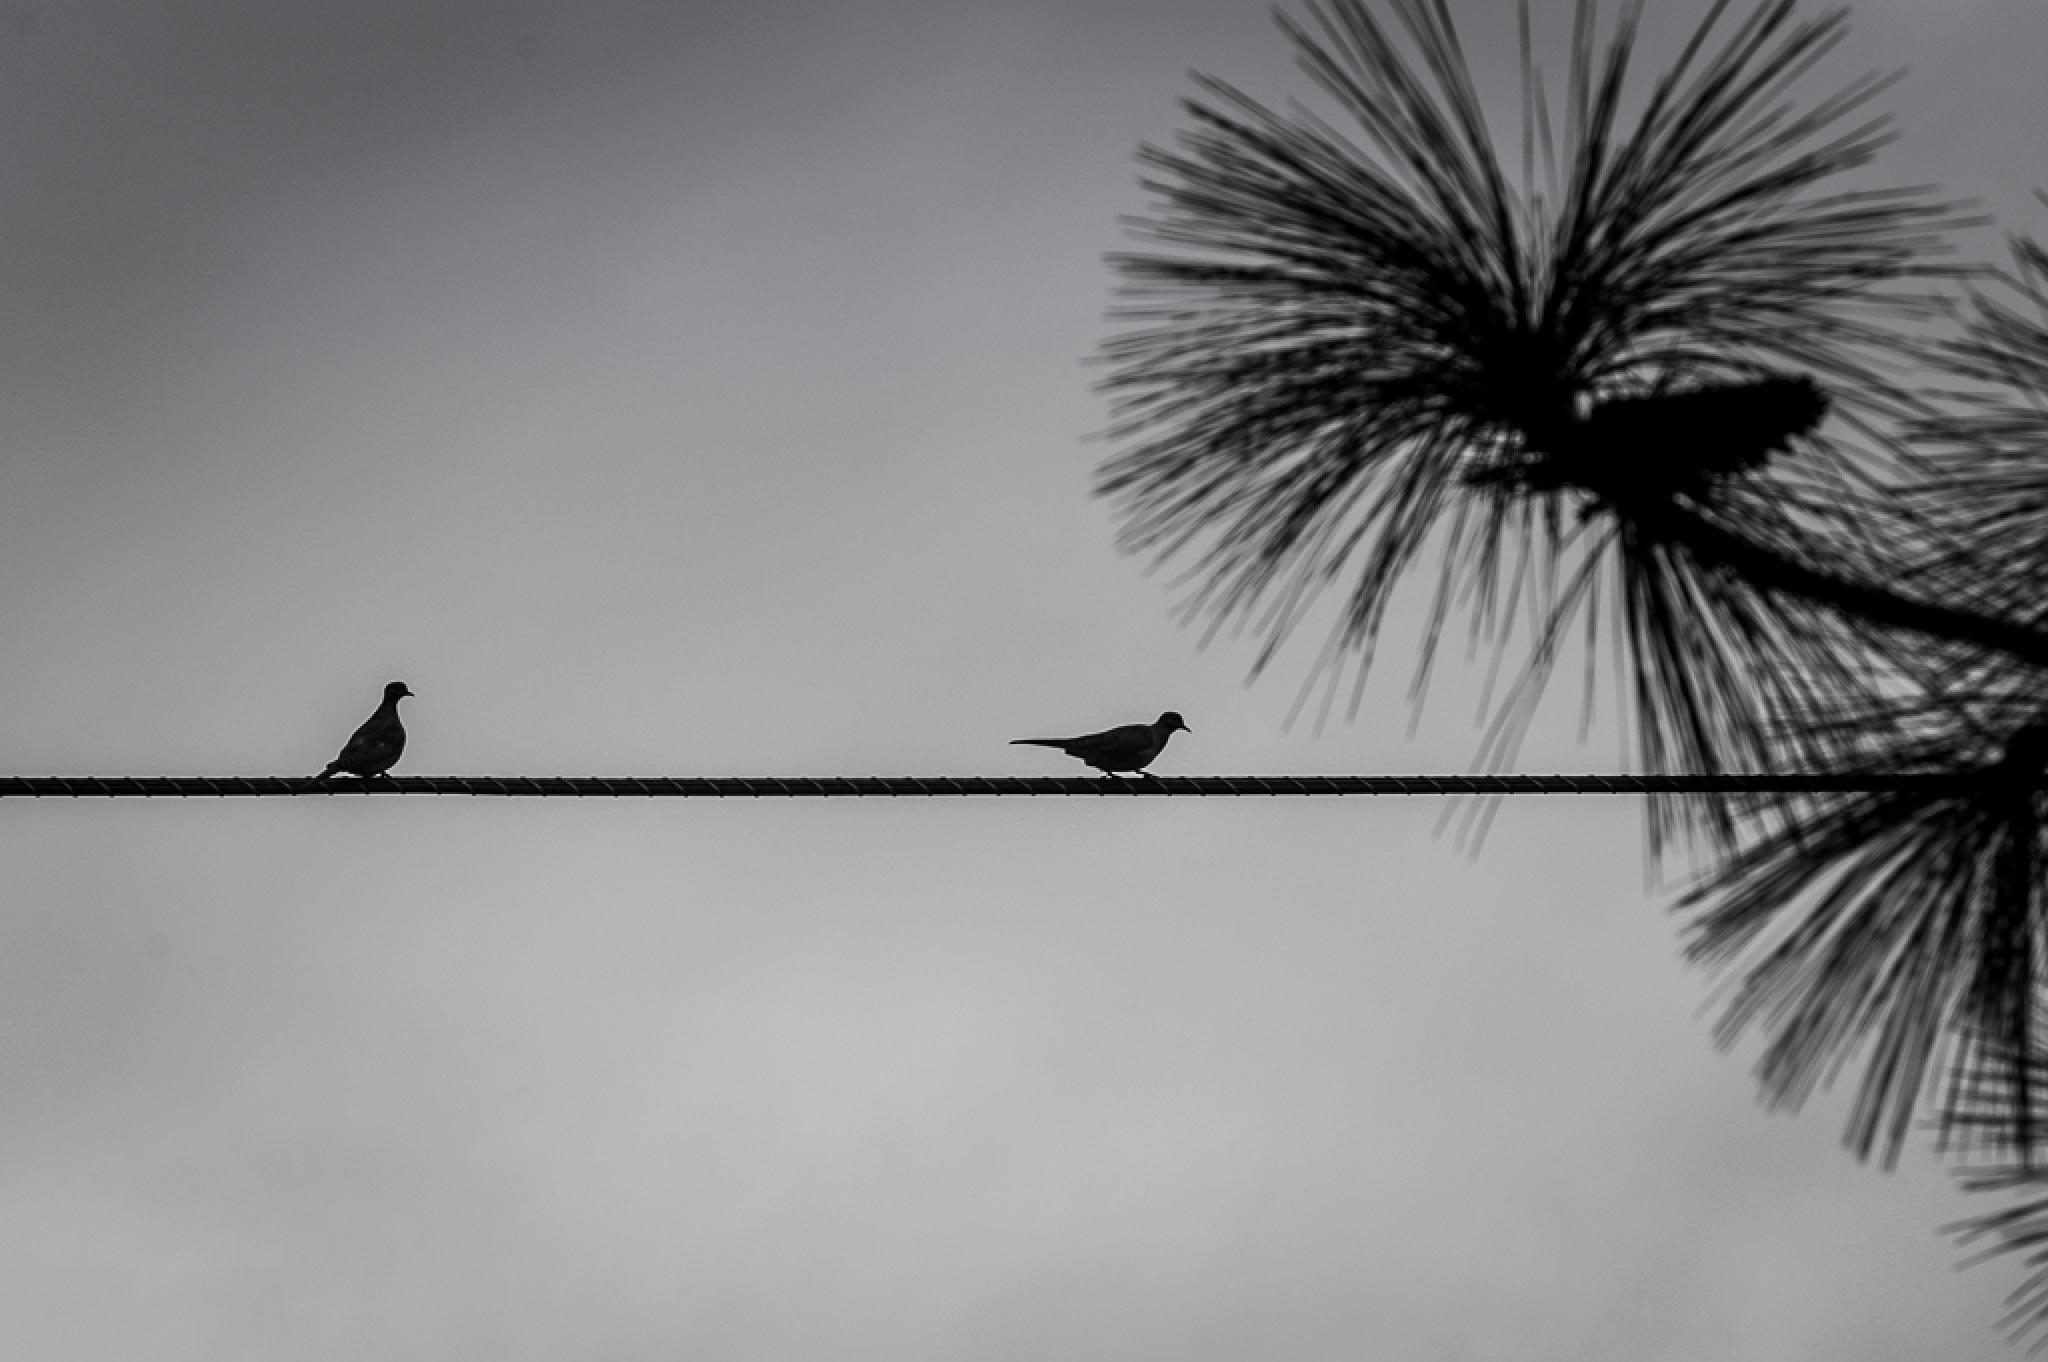 birds on a wire by wacissa